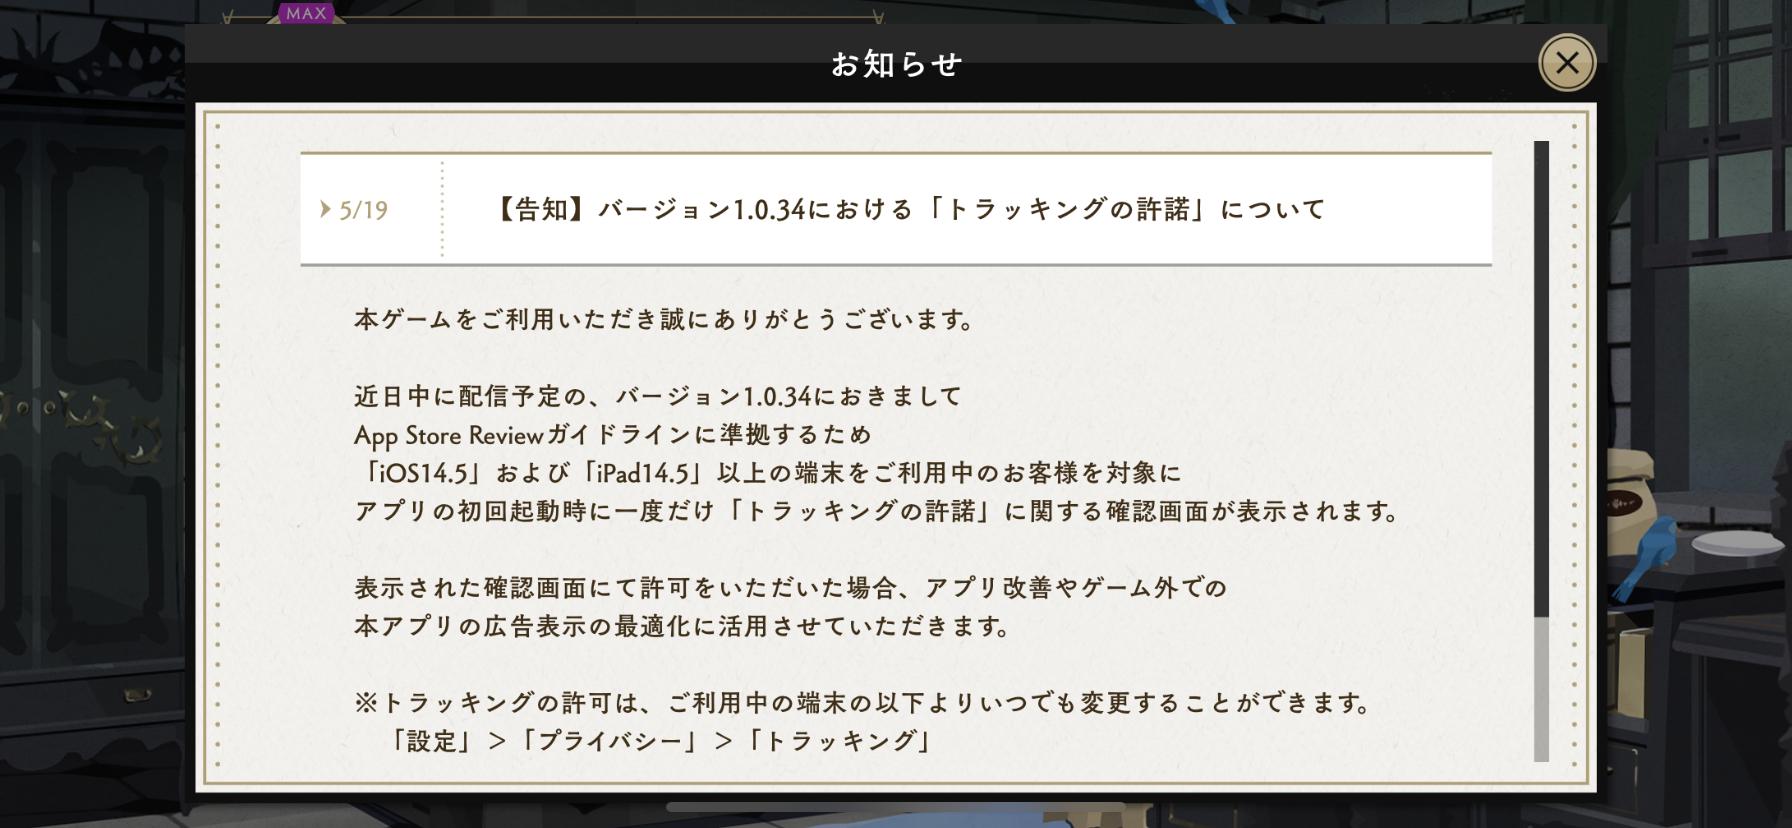 f:id:motimoti444:20210520125320p:plain